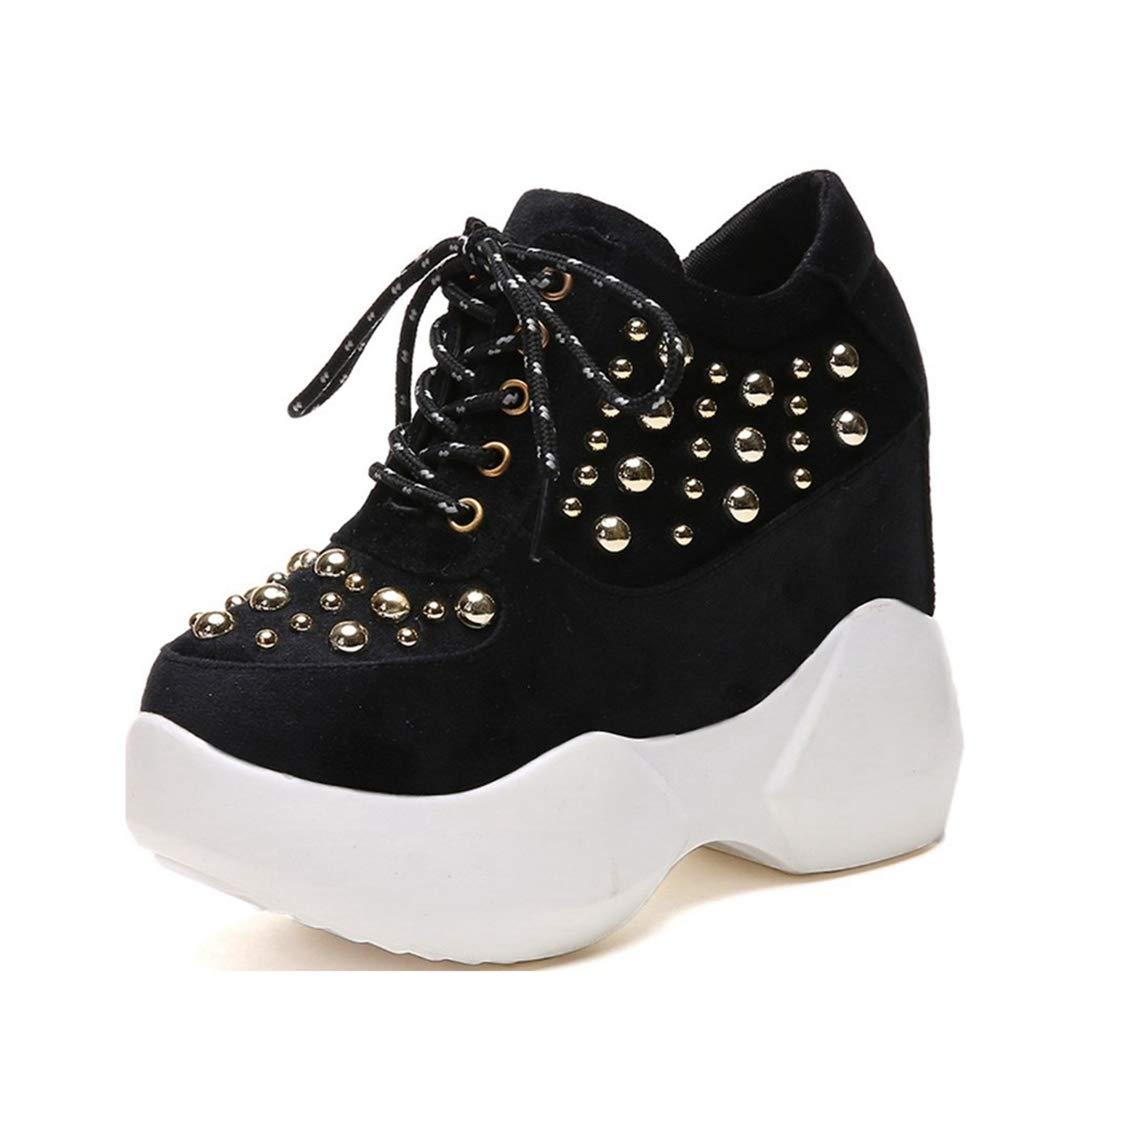 c3c064d620772 Amazon.com: DOSOMI Women's Wedge Sneakers 12cm Height Increasing ...